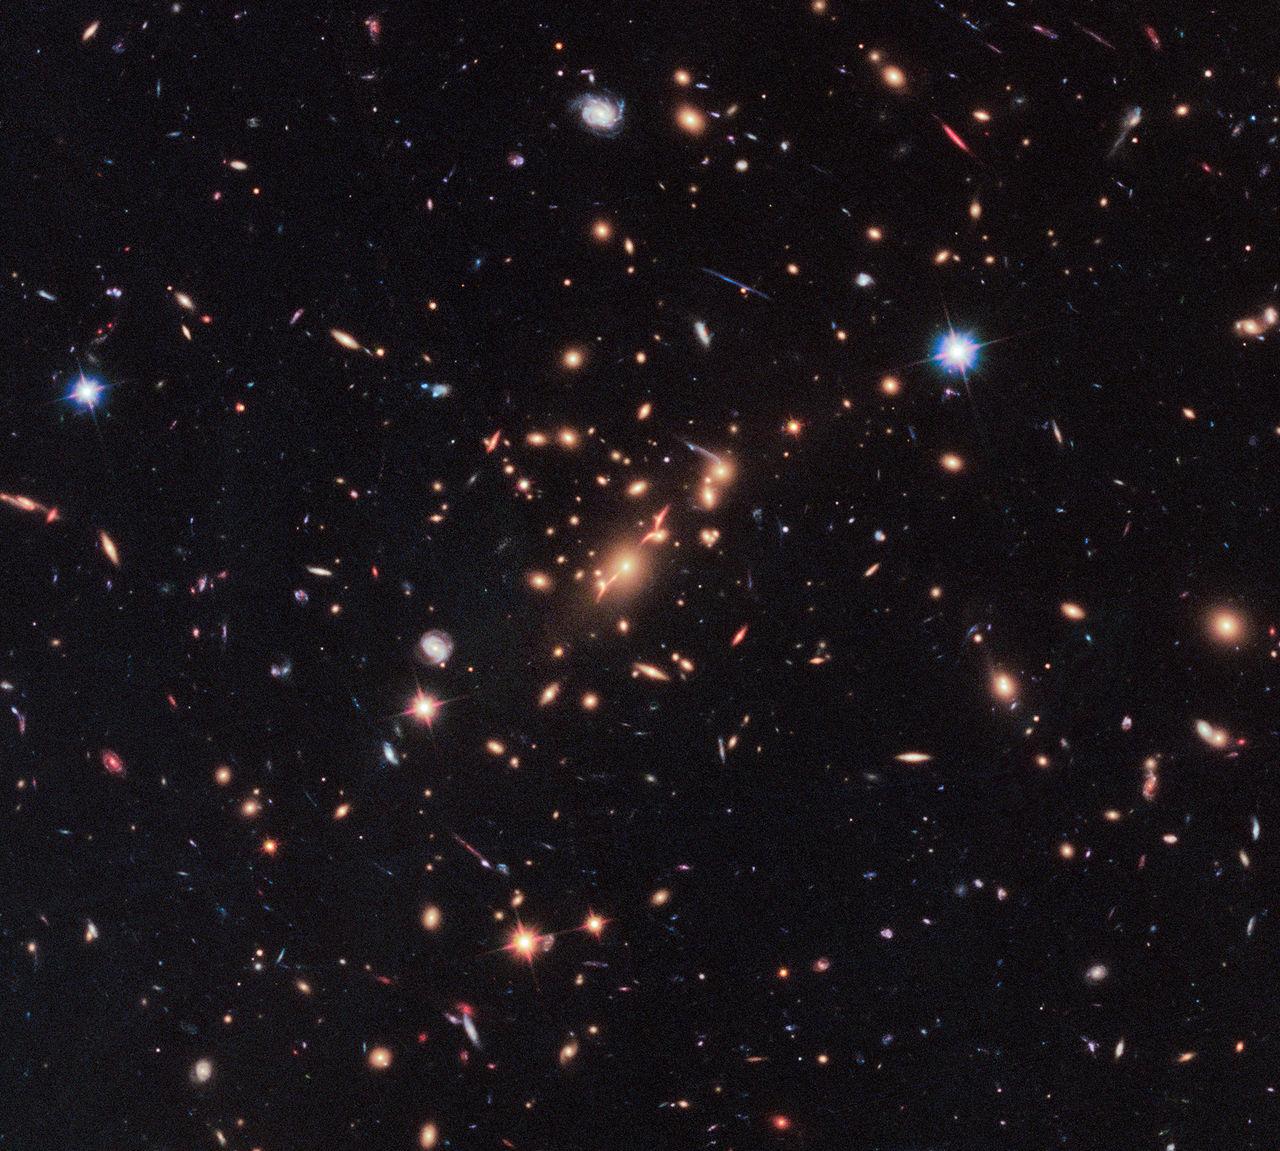 Nobelpristagare tror att det funnits tidigare universum